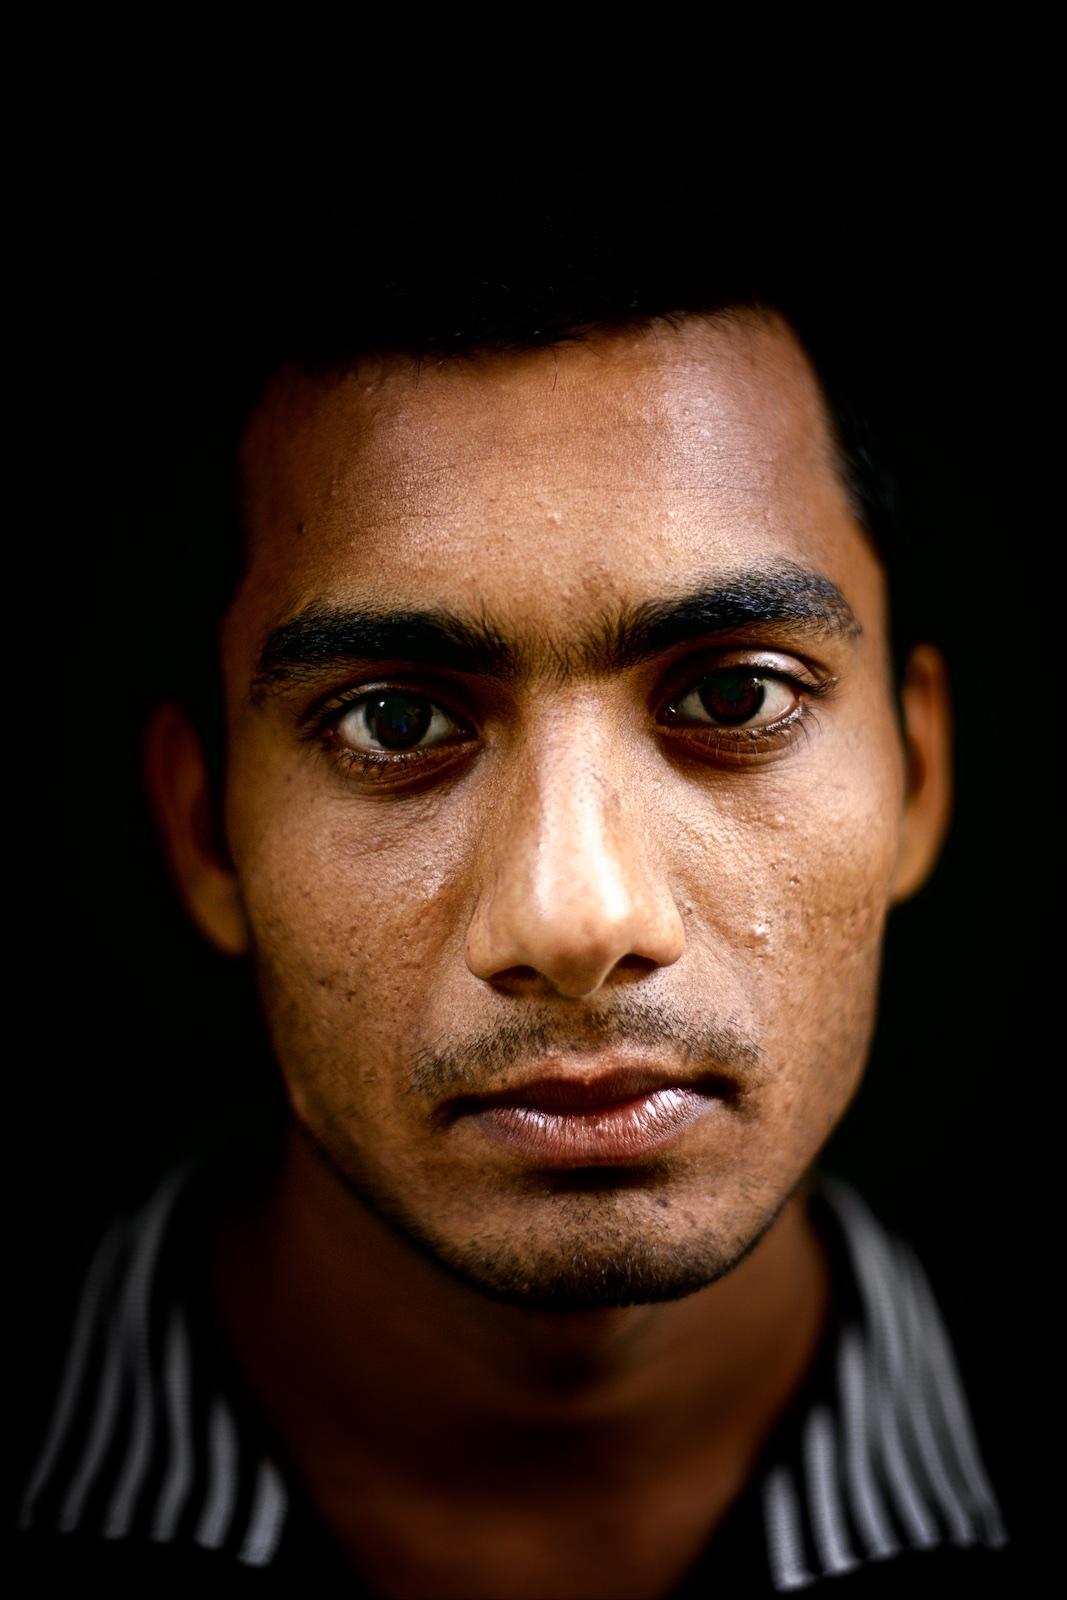 permanently-temporary-refugees-italy-rifugiati-italia-denis-bosnic-photography-portraits-9.jpg